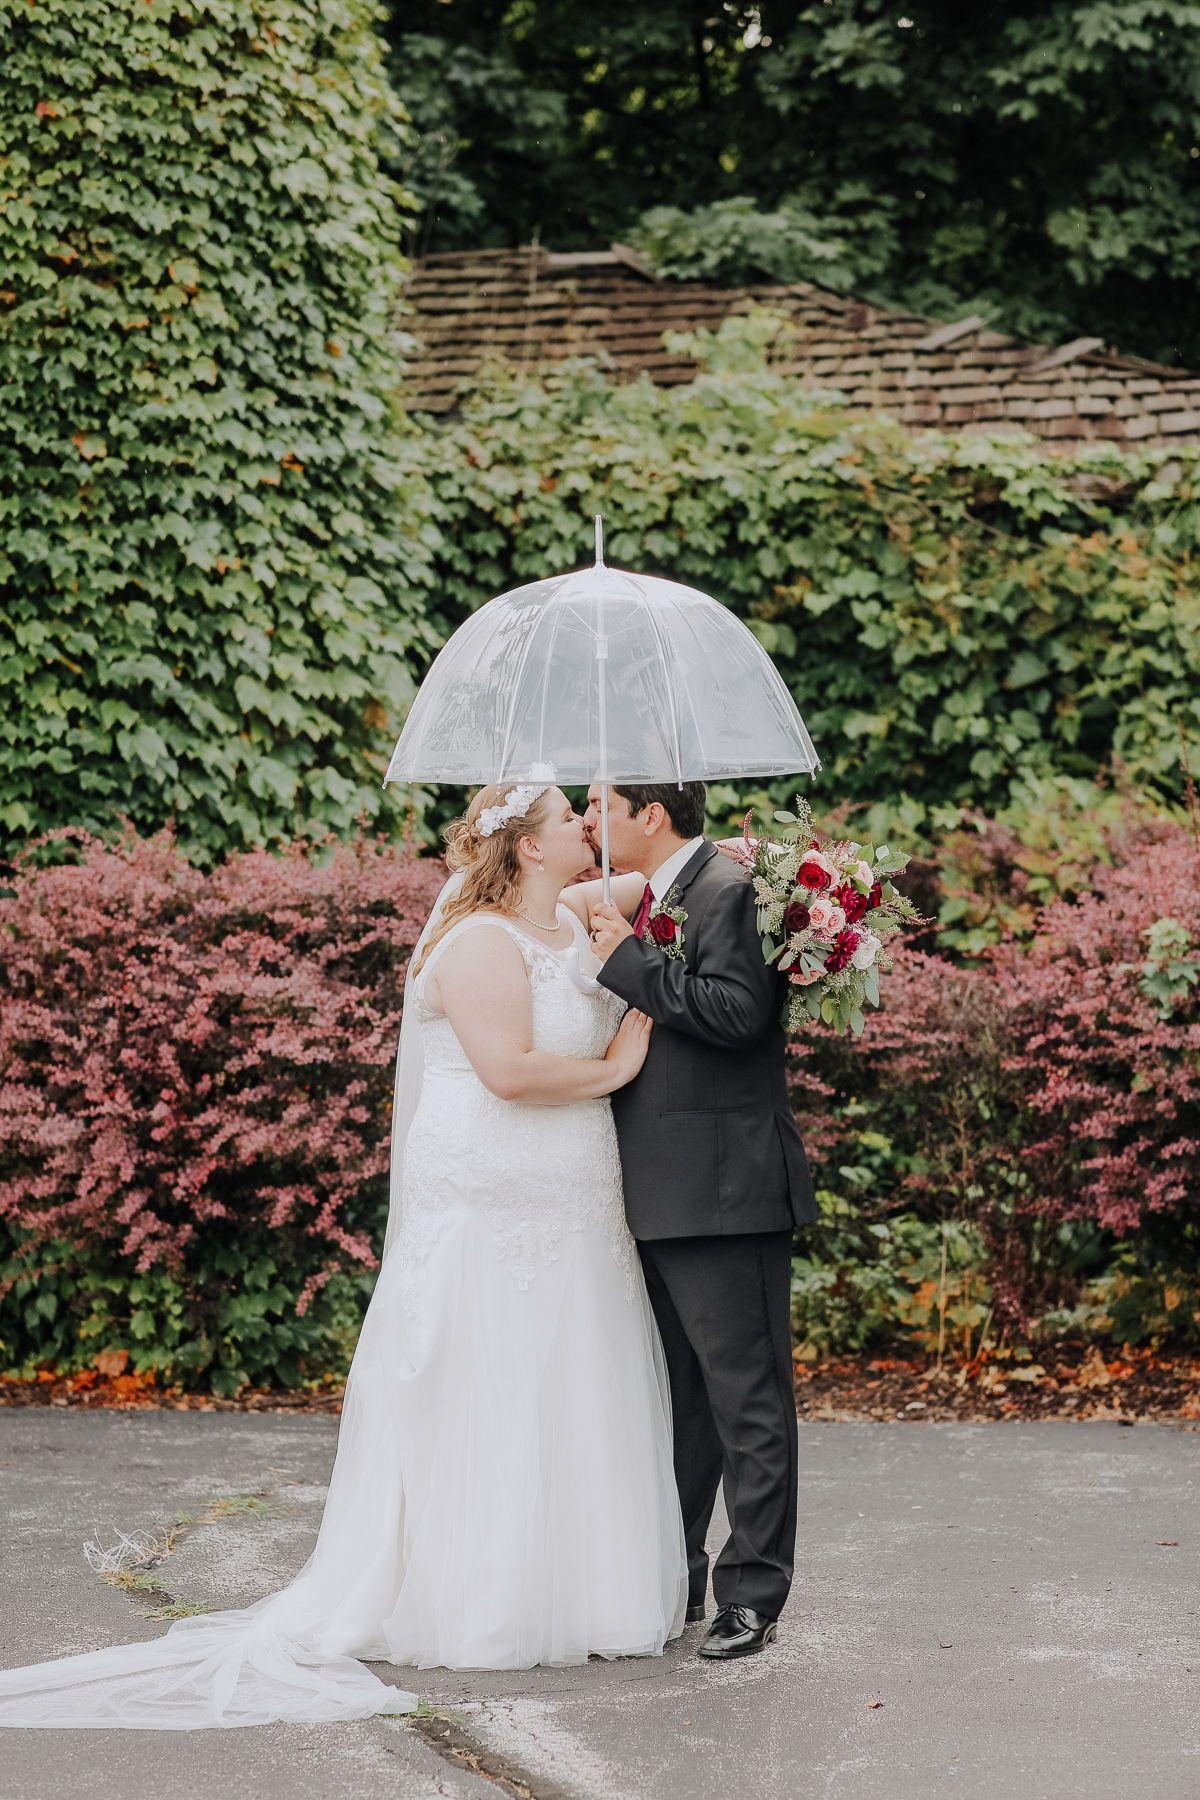 Summer Rainy Wedding Photography Inspiration - Clear Umbrella Photo Ideas